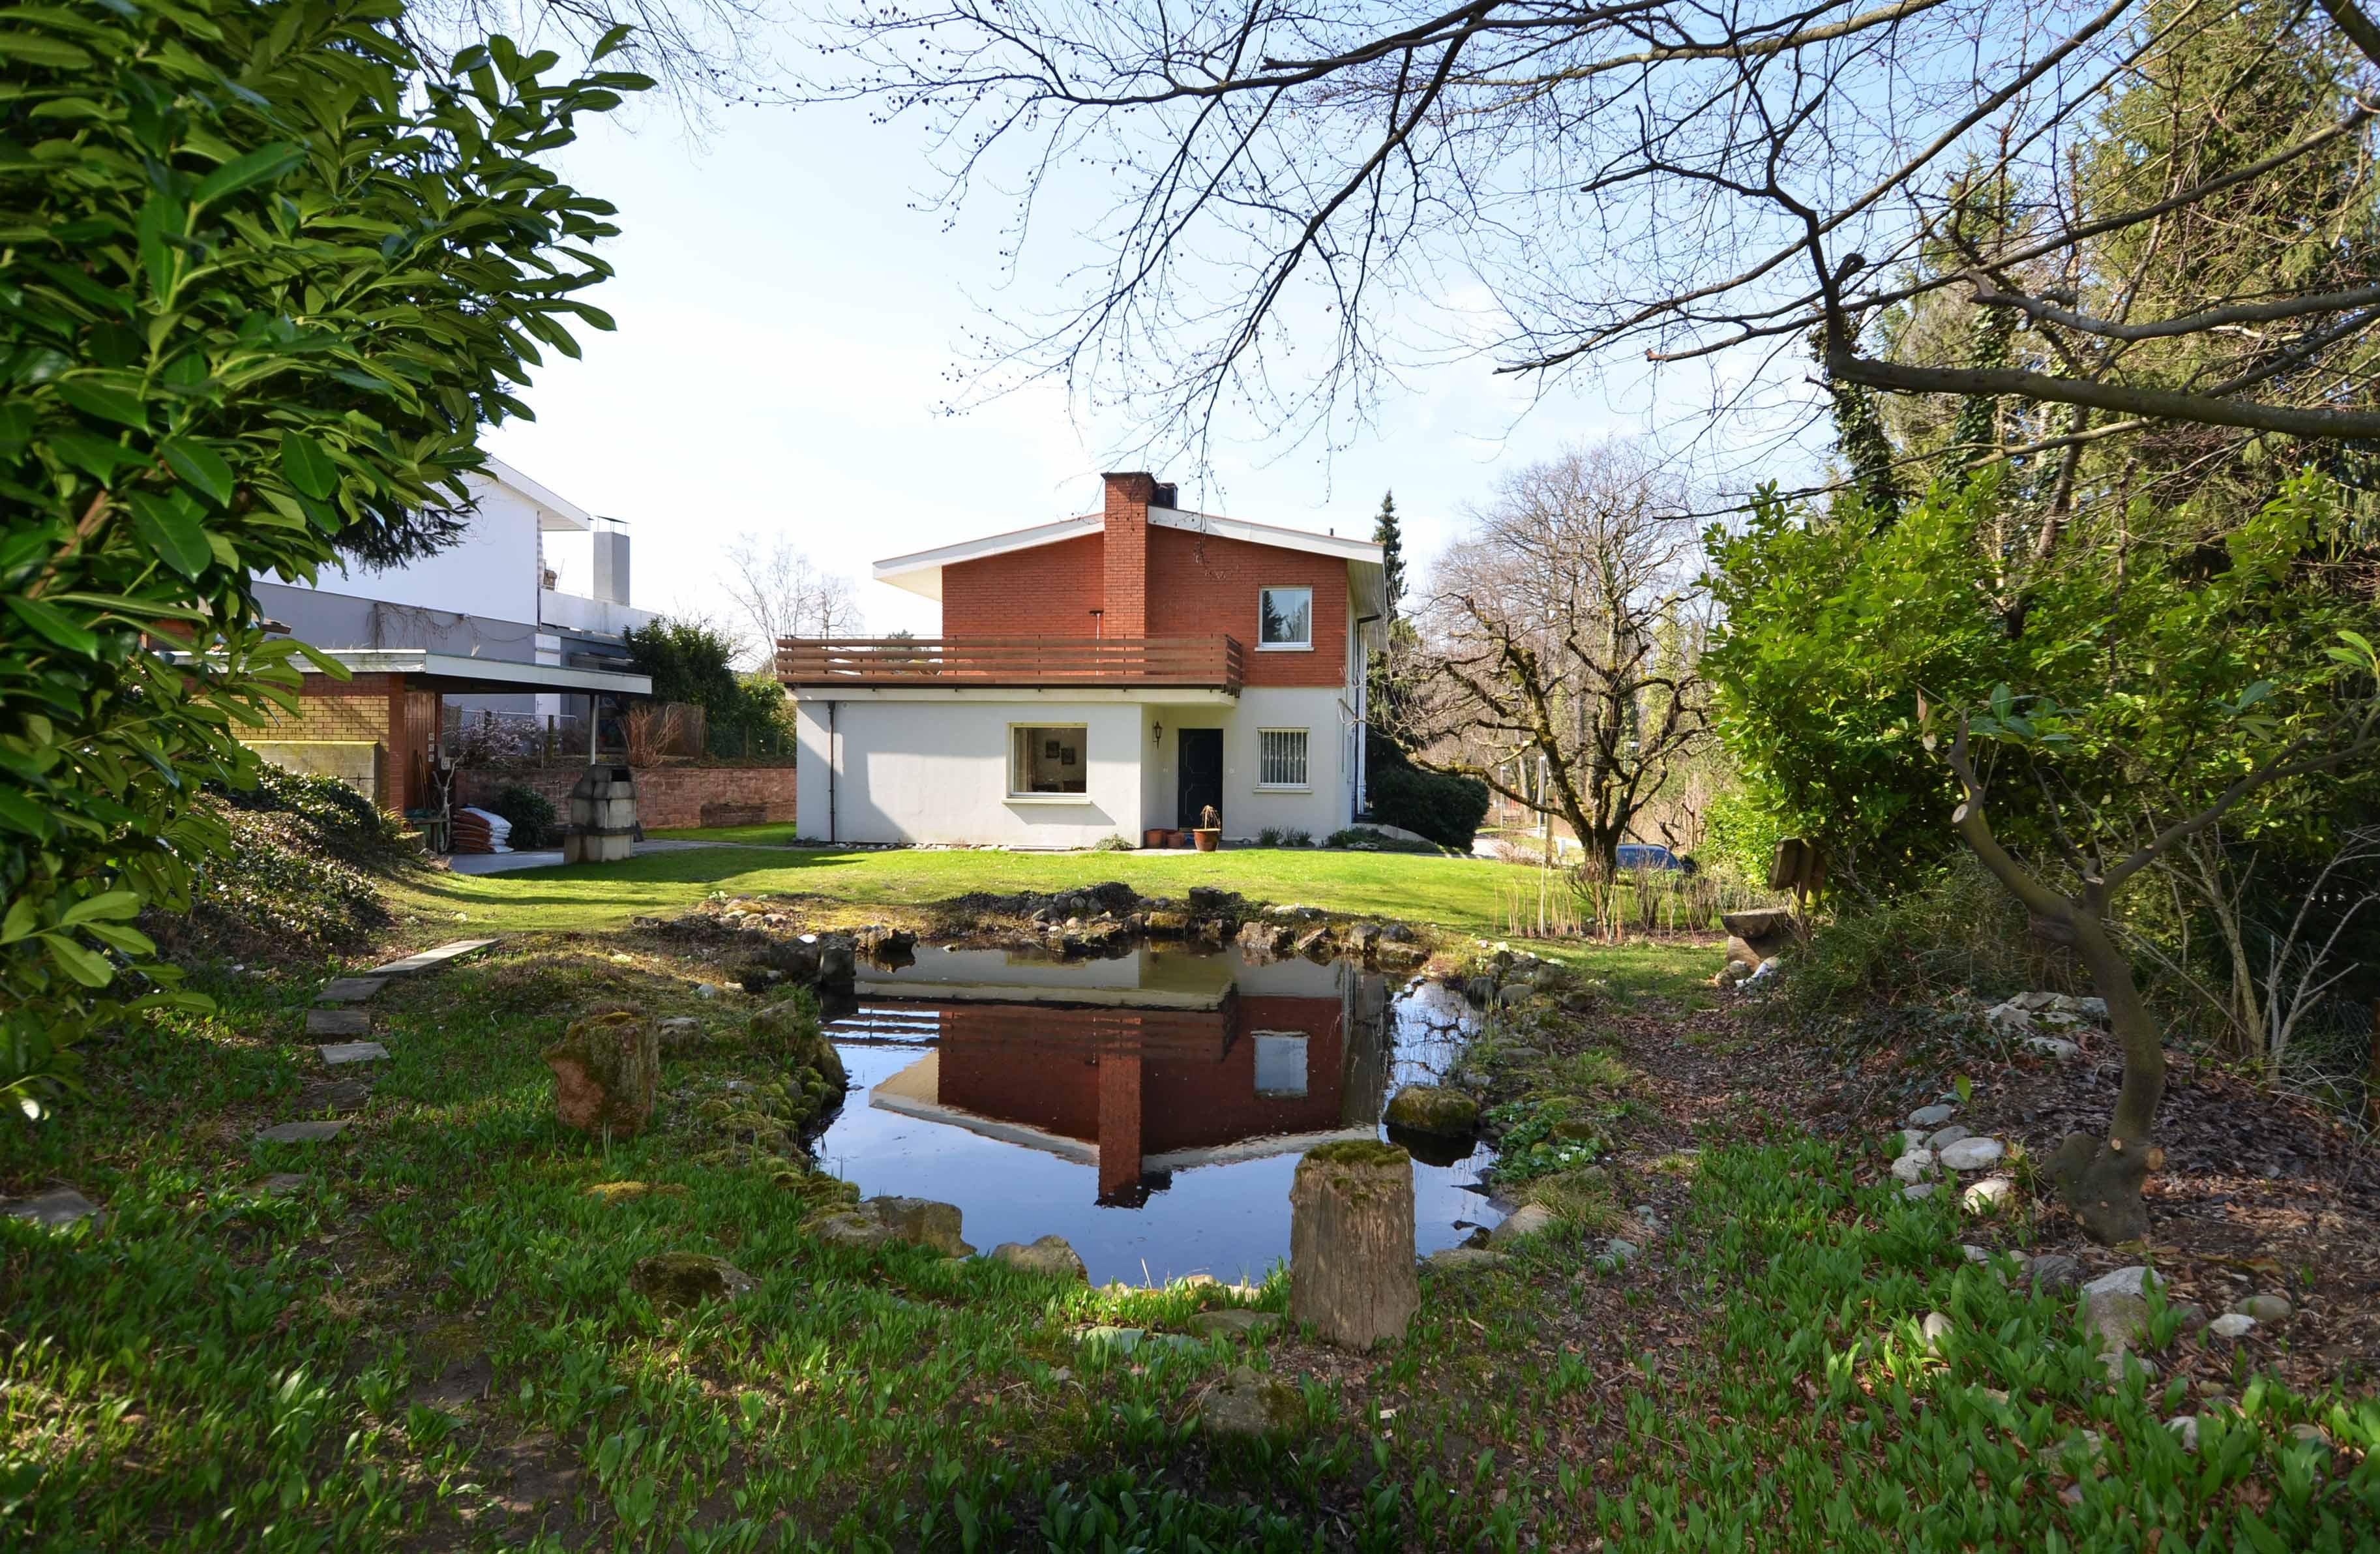 5-Zimmer-Doppelhaus-Hälfte an Privatstrasse in Bottmingen